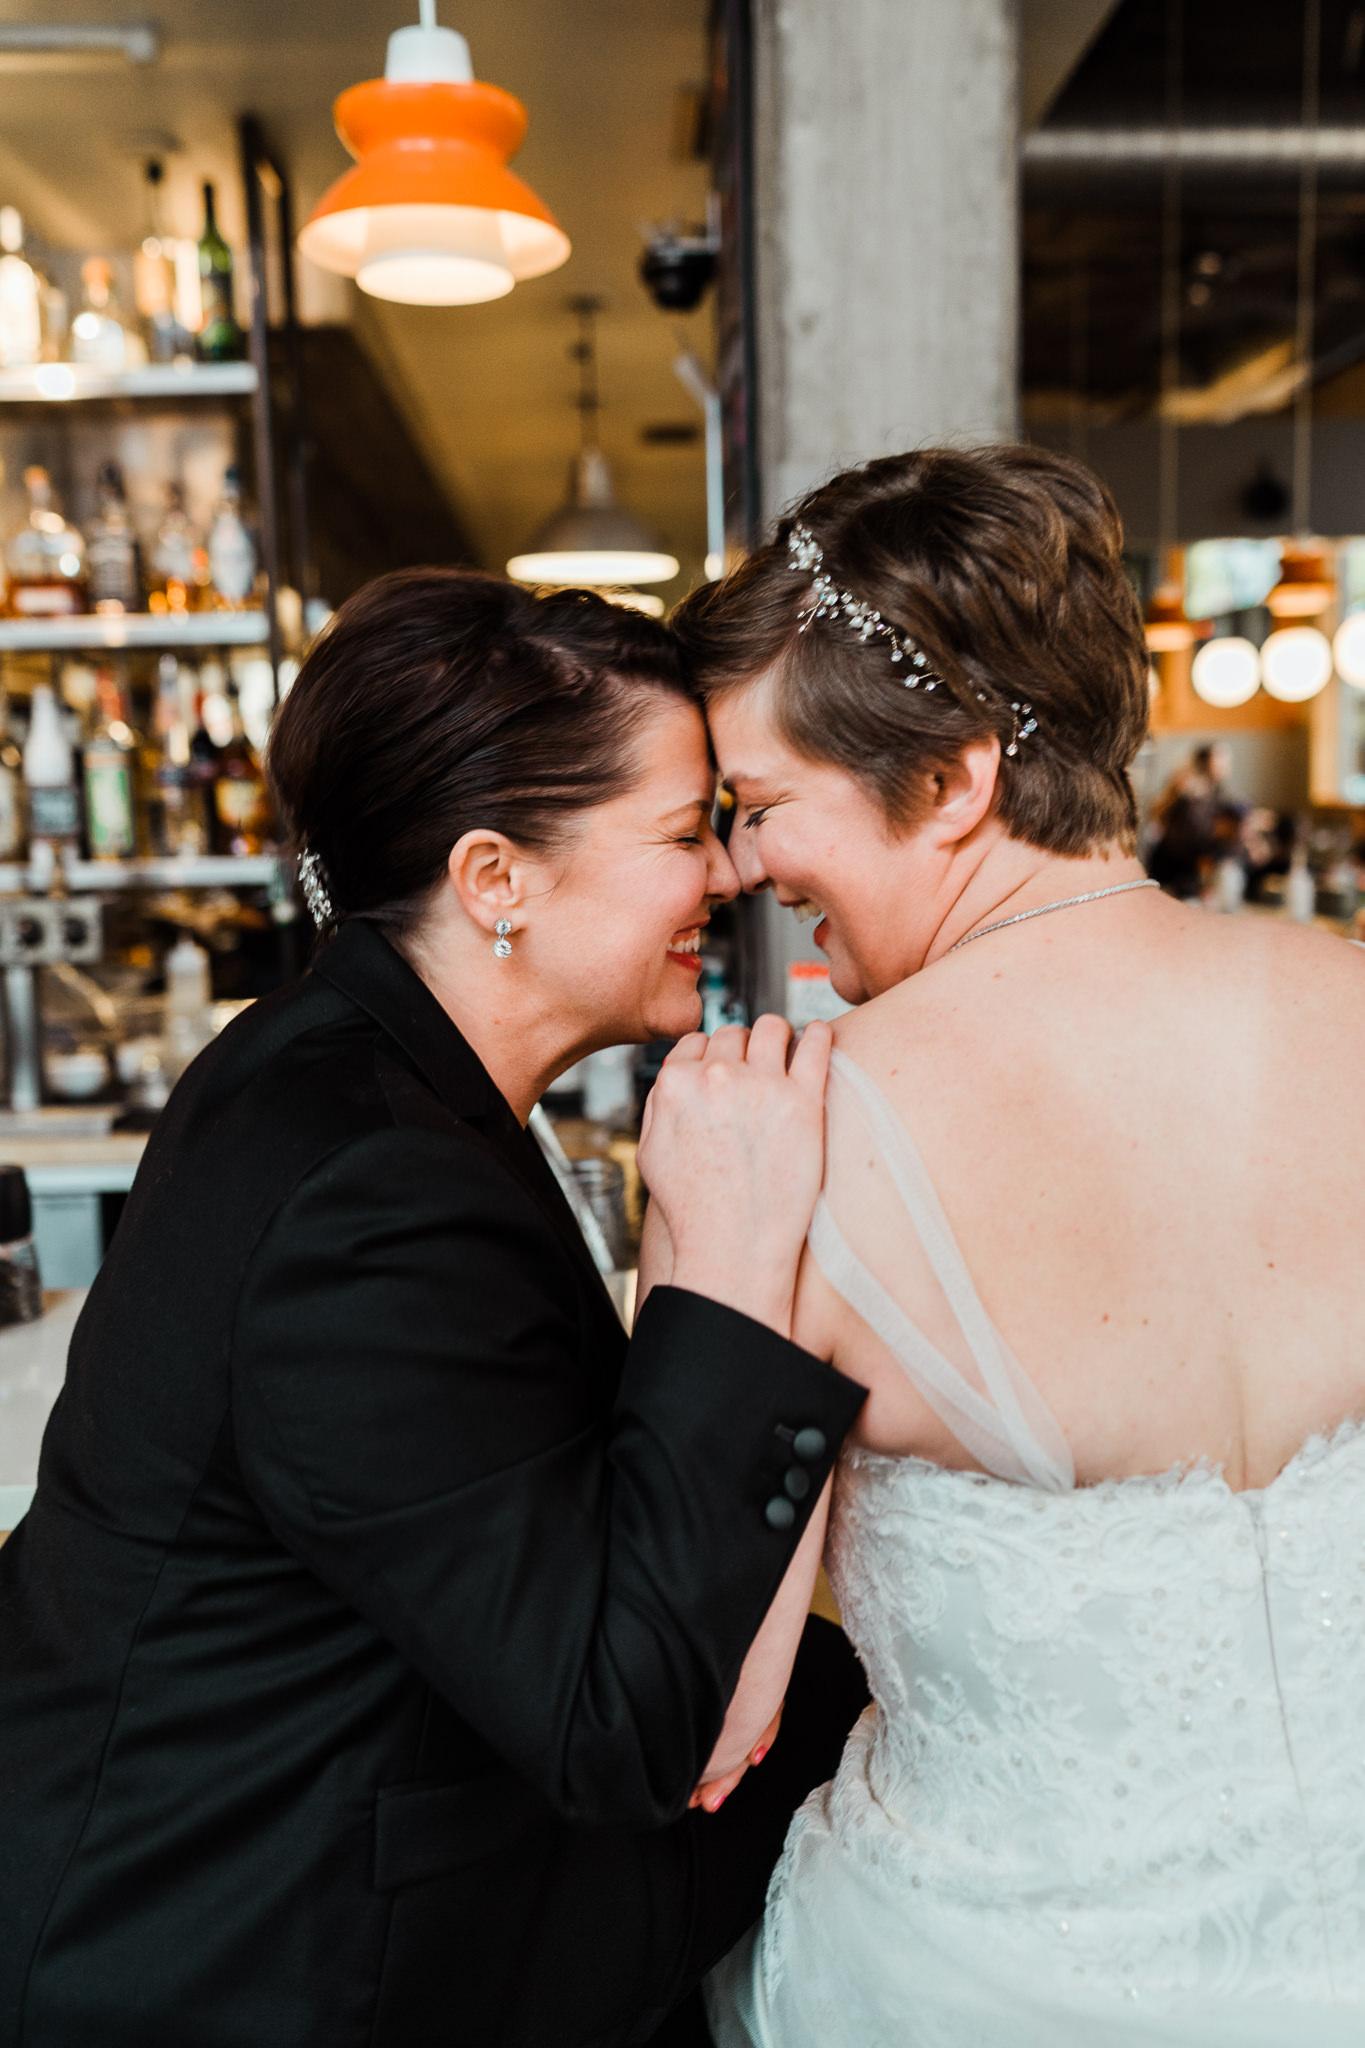 Bride Same Sex Portrait Forehead touching